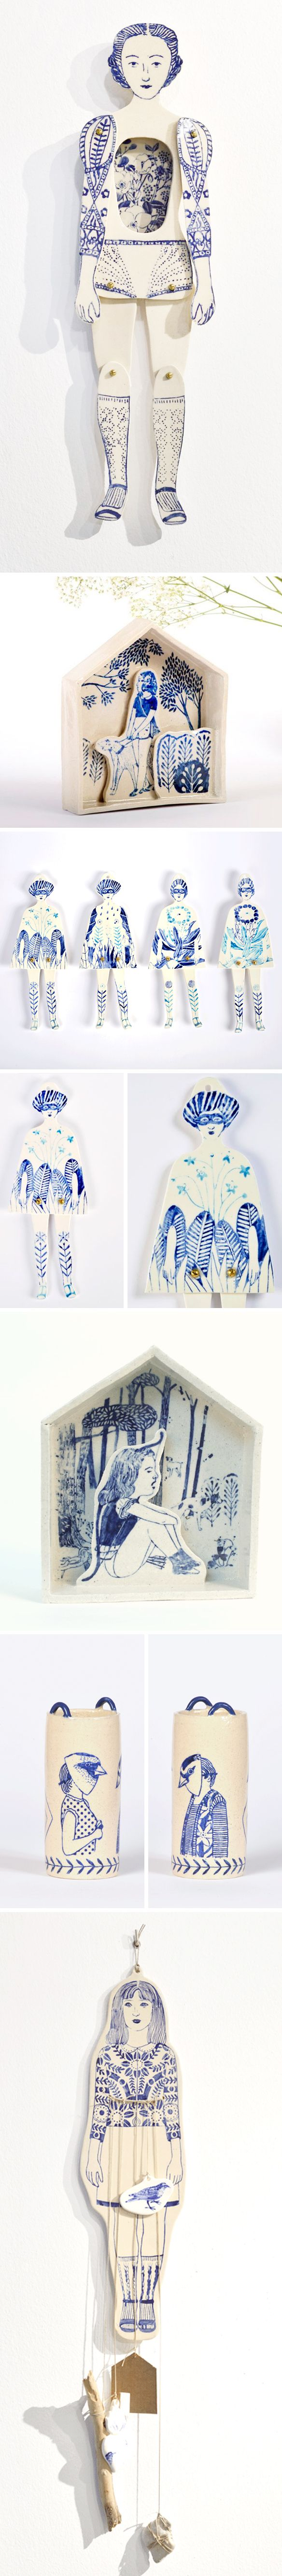 Ceramics by Sonia Pulido <3